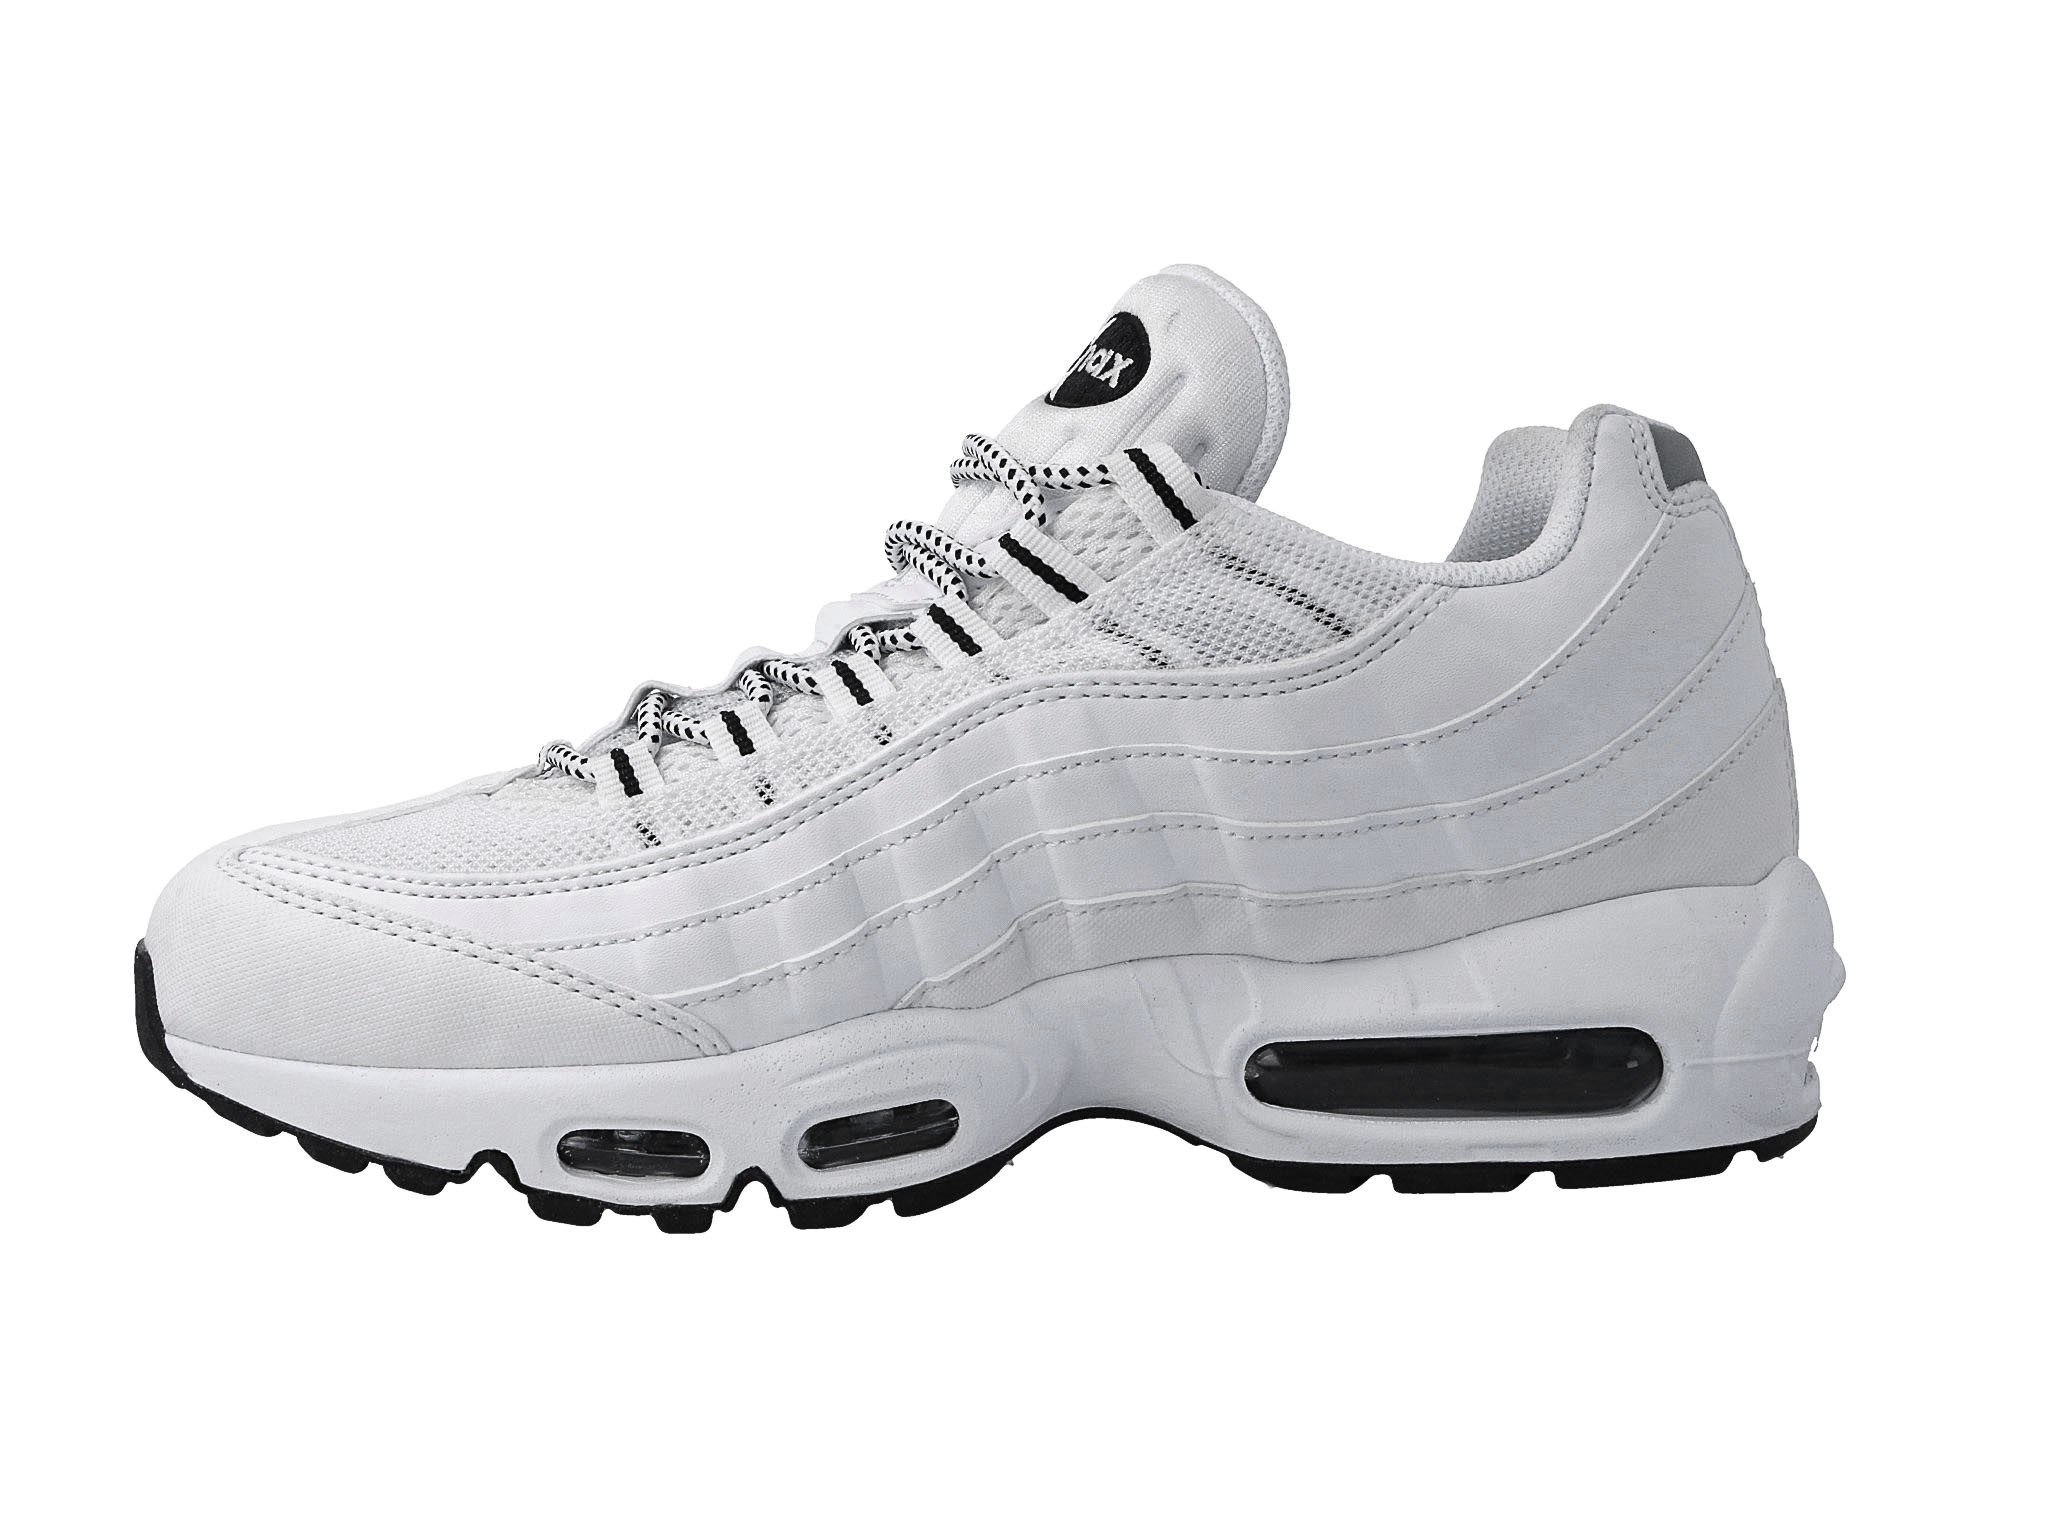 Buty Nike Air Max 95 WHITE 609048 109